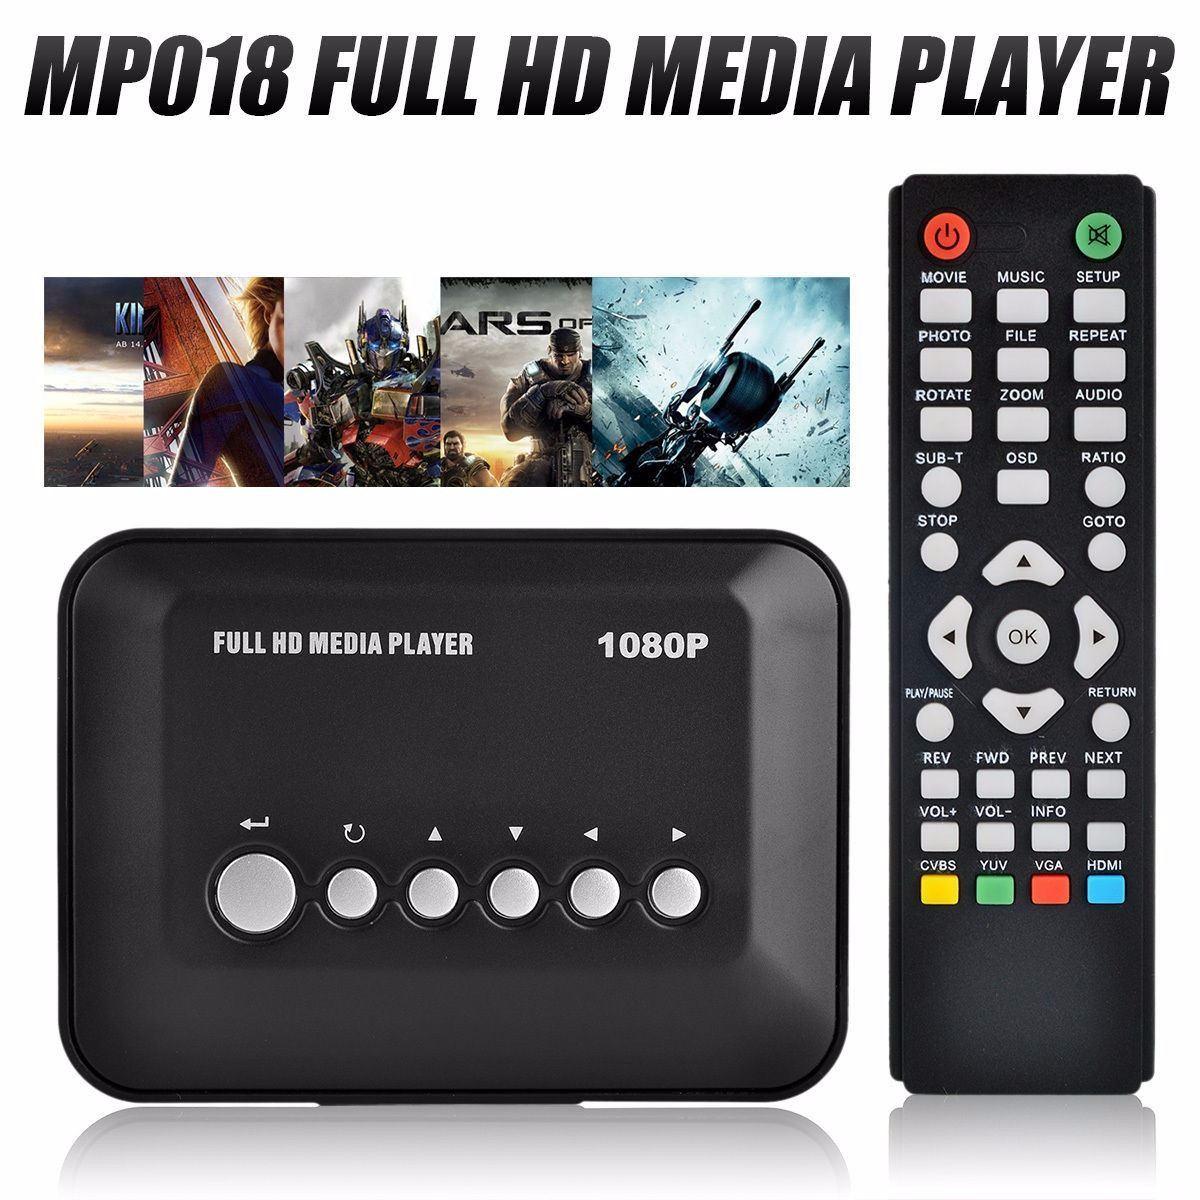 Full Hd Media Player 1080p Download Hdtv 1080p Resolucion Led 55 Lg Uhd 4k Smart Tv Uk6350 Camera Replay Xd 1080 Mini: Hd Media Player Full 3d 1080p Hdmi Rmvb Mkv Avi Divx H.264